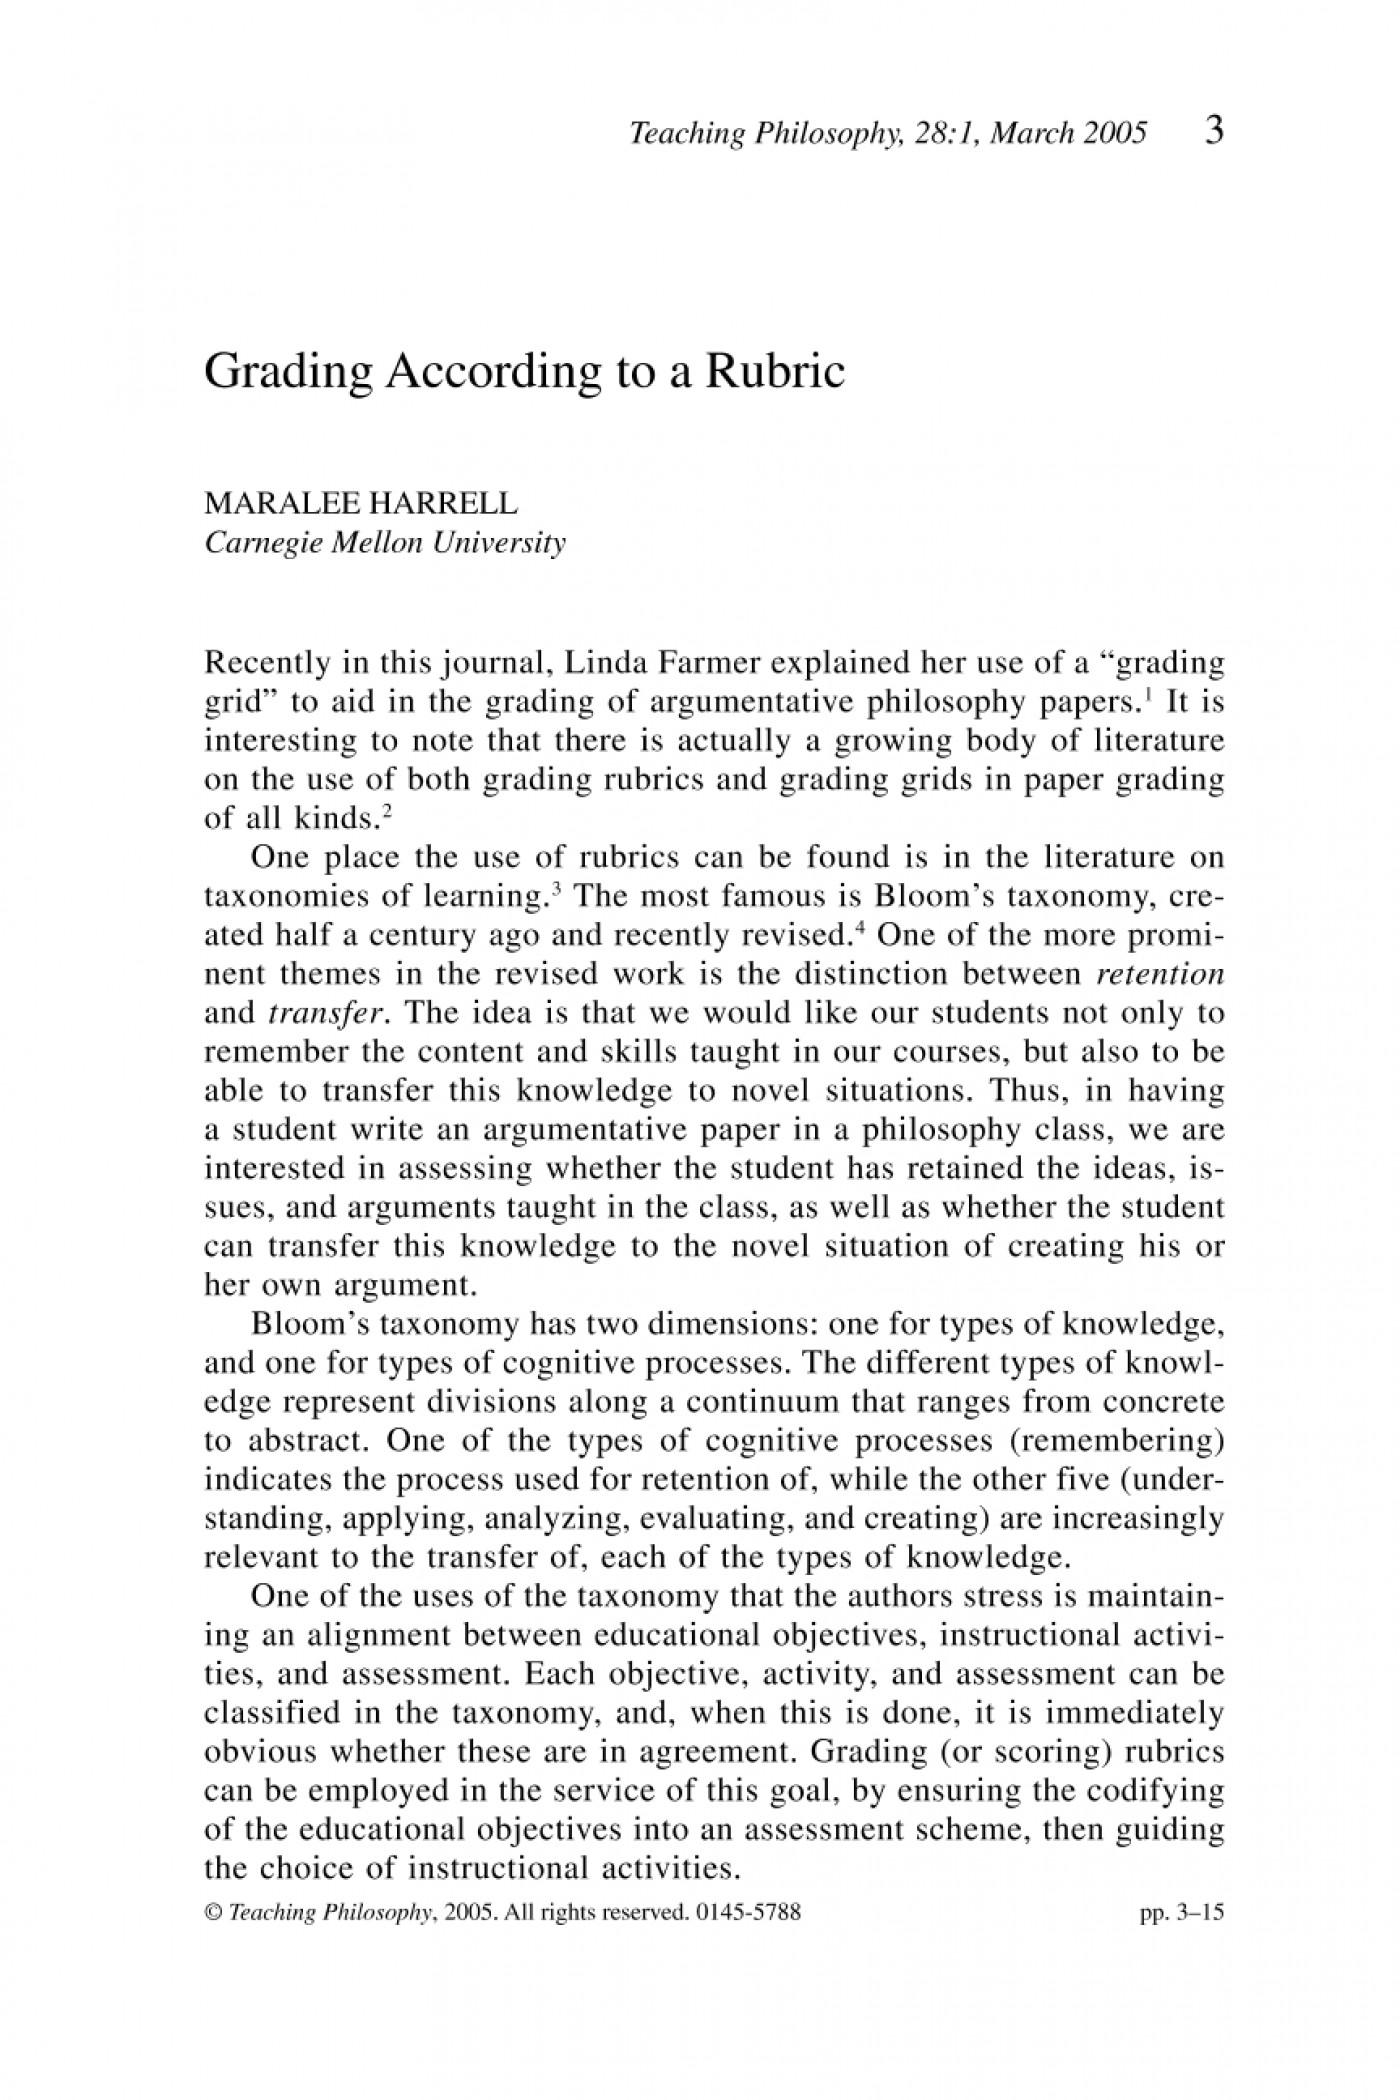 004 Argument Essay Ideas Good Debate Topics How To Write Defin Definition Marvelous Prompts Persuasive High School 1400